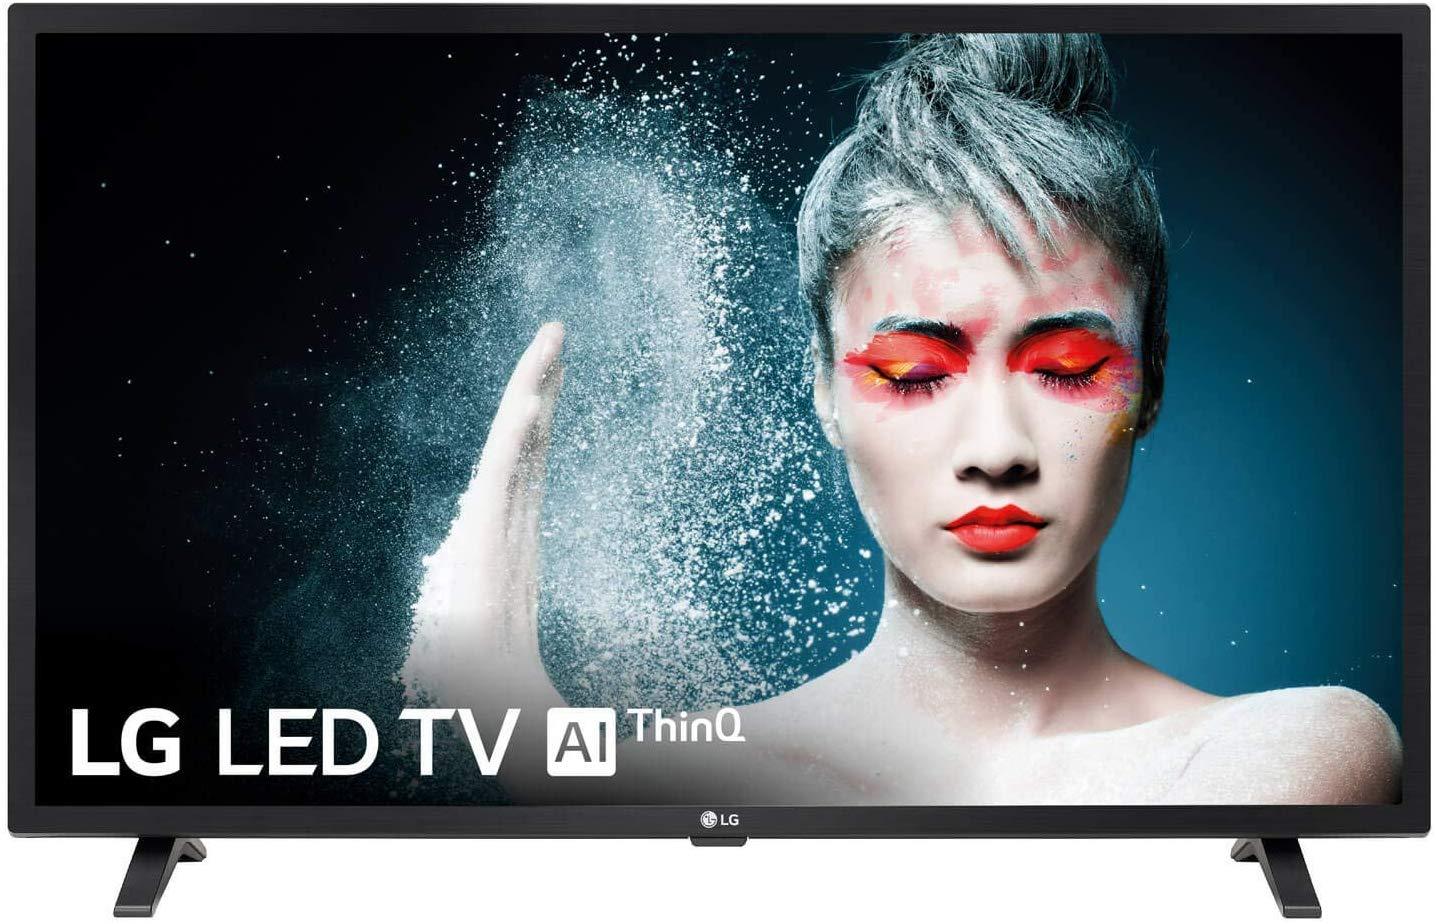 "LG 32LM6300PLA - Smart TV Full HD de 80 cm (32"") con Alexa Integrada, Procesador Quad Core, HDR y Sonido Virtual Surround Plus."